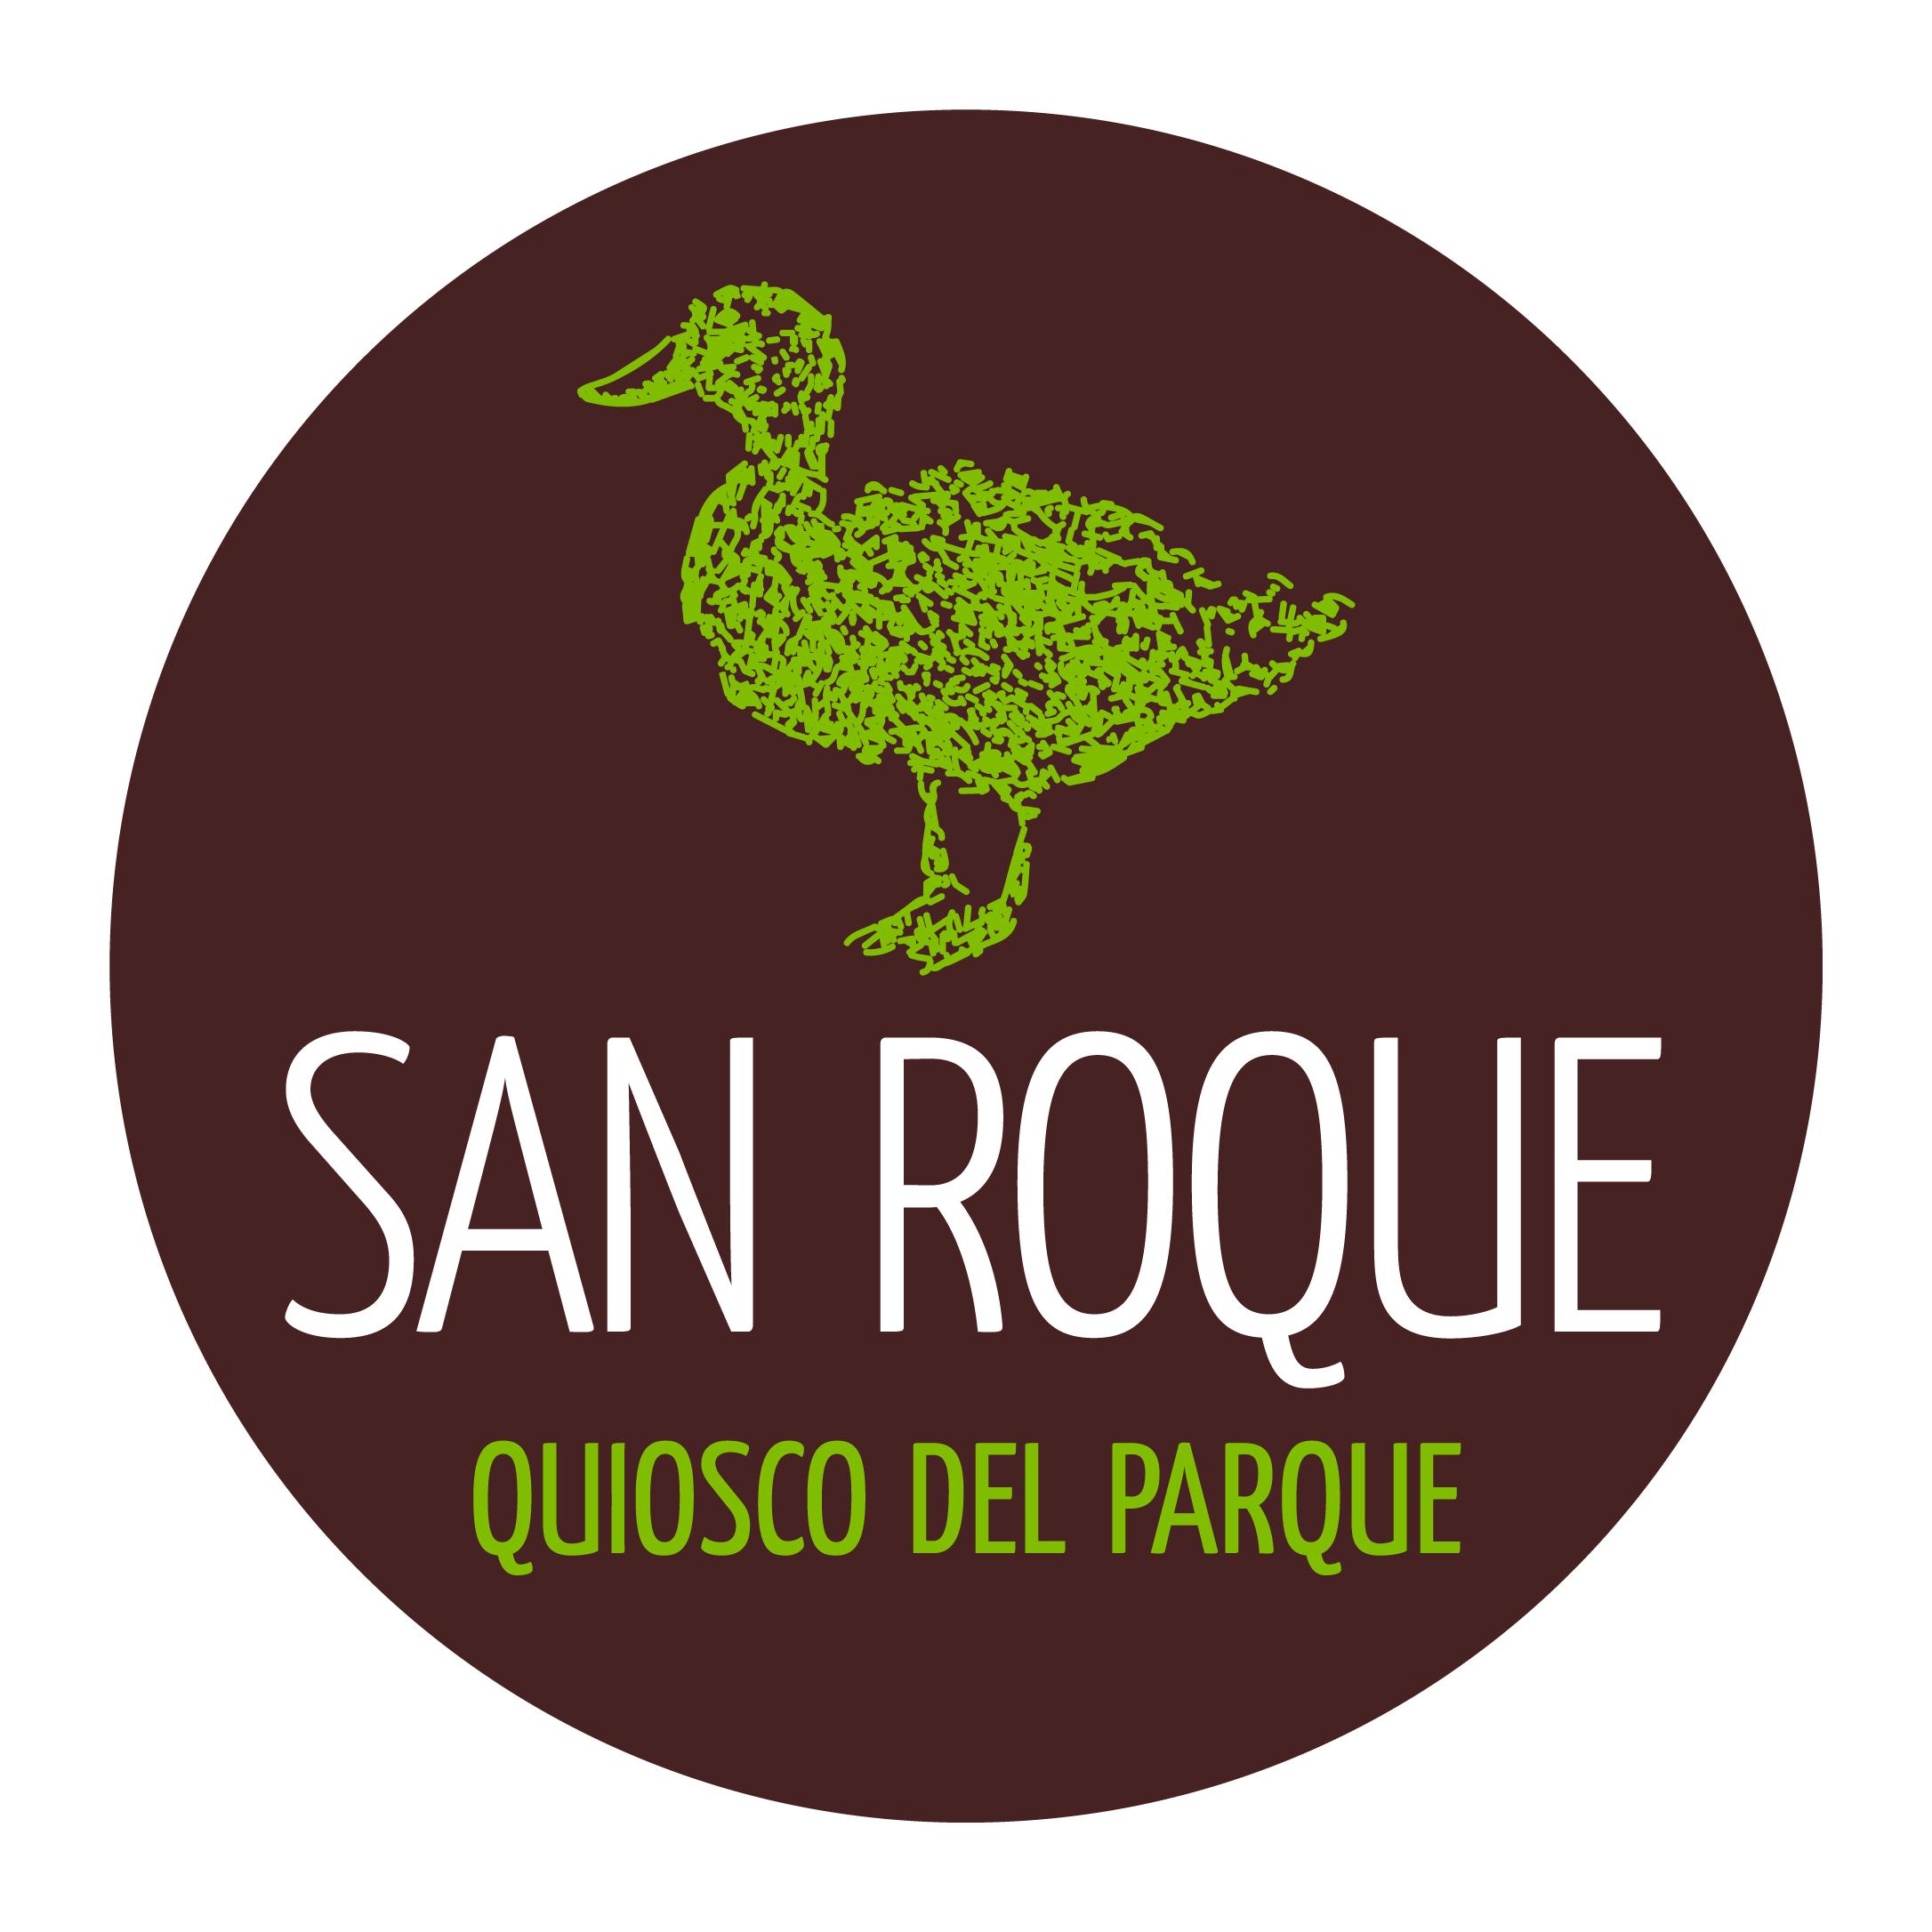 San Roque Quiosco del Parque